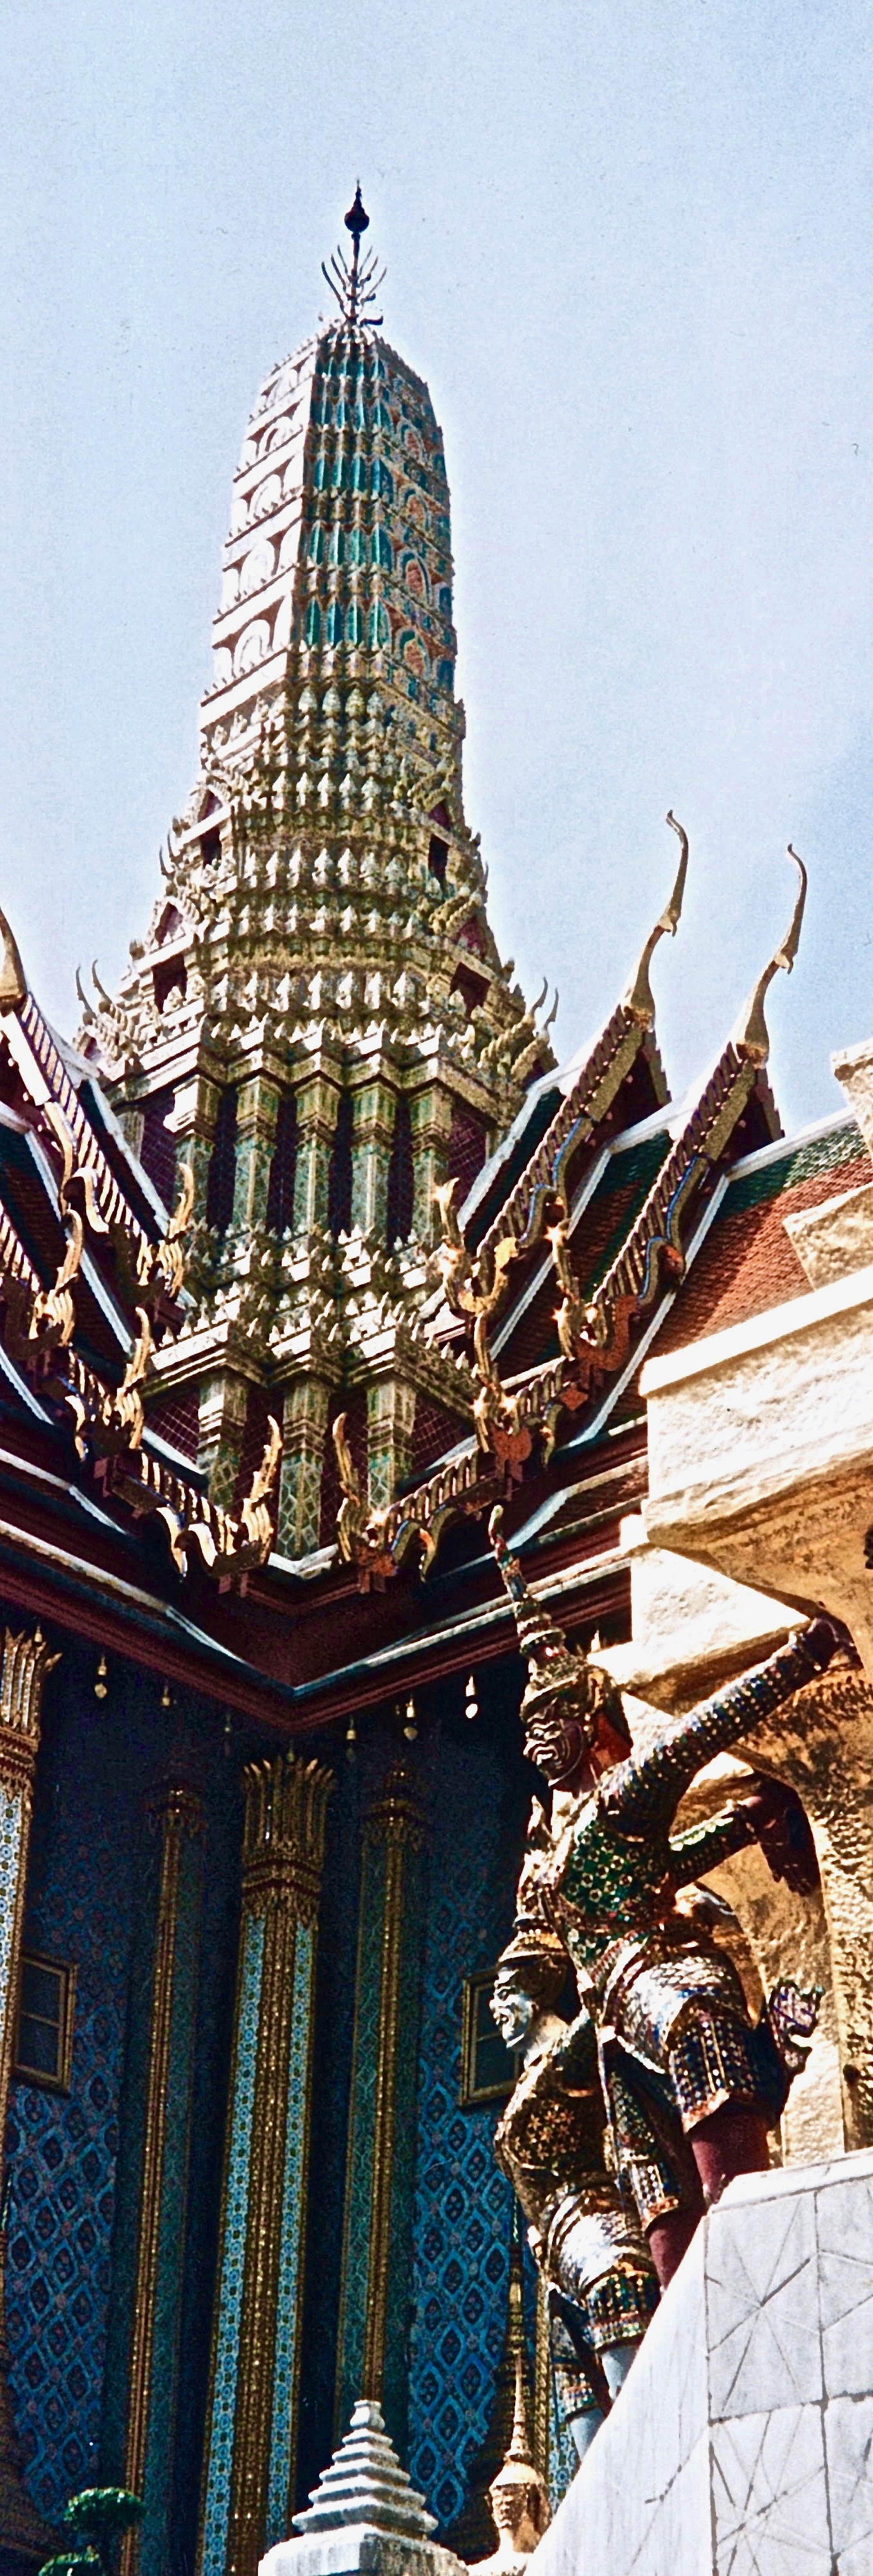 Thailand Bangkok Palace.jpg